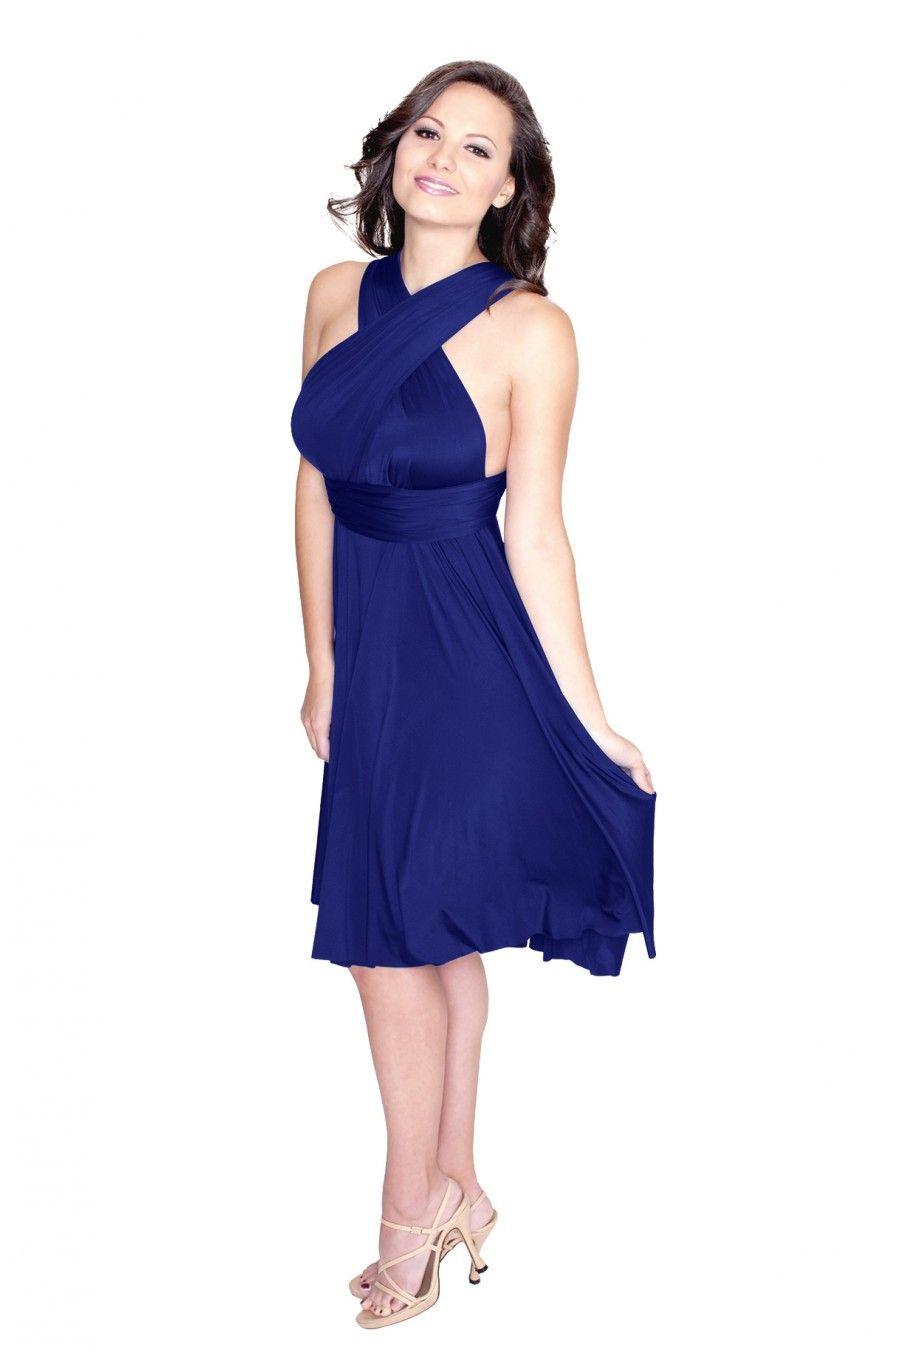 sakura royal blue midi convertible dress   infinity dress